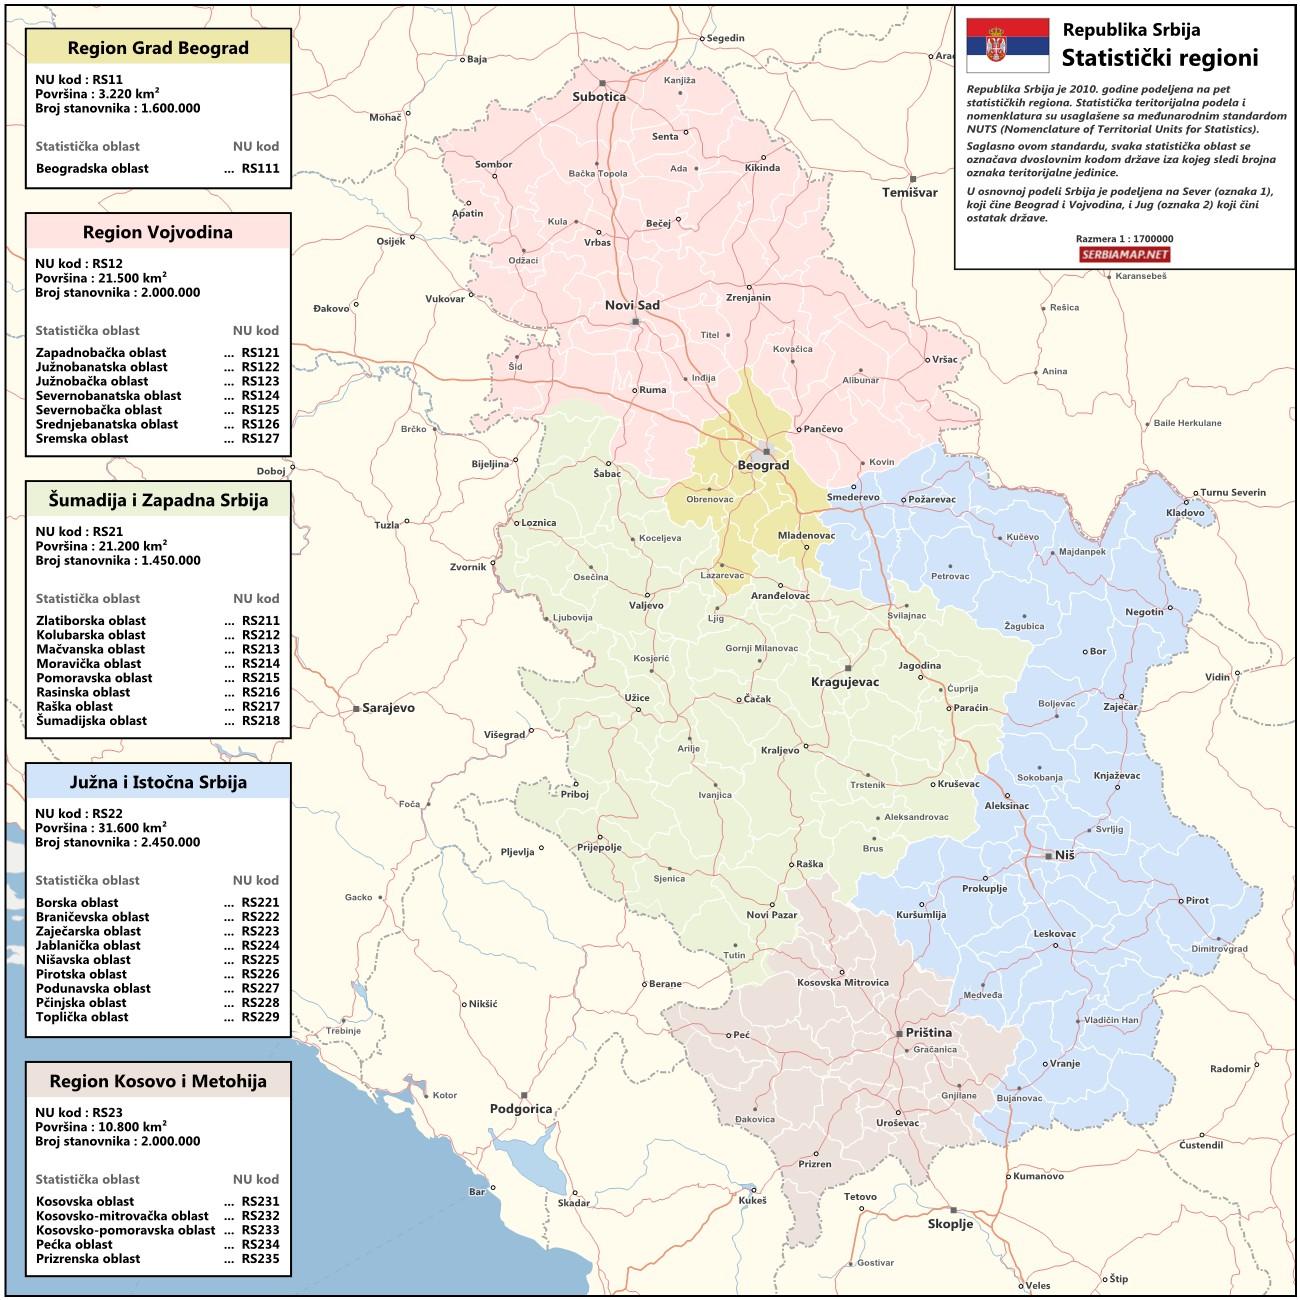 regioni srbije karta Serbiamap.Net: Mapa statističkih regiona Srbije regioni srbije karta